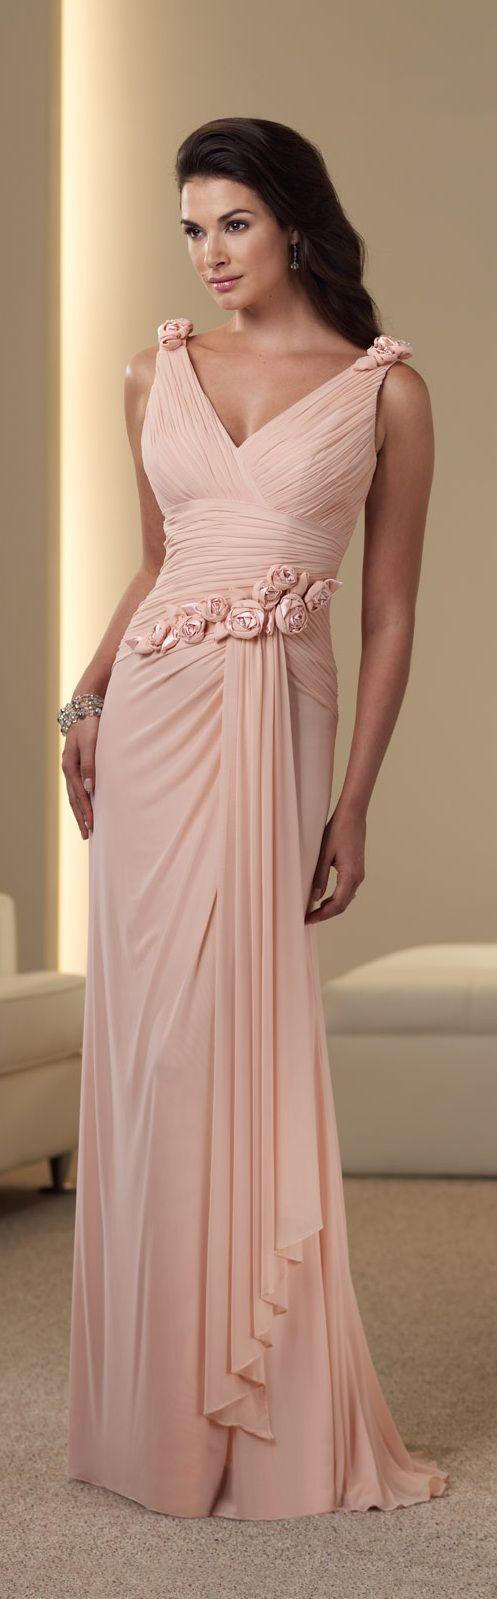 #Evening Dress #Evening Gown #Splendid Evening Dress Design #Fashion Designer #Miracle Gown #Evening Dress Designer  Montage Boutique haute couture 2013/14 ~